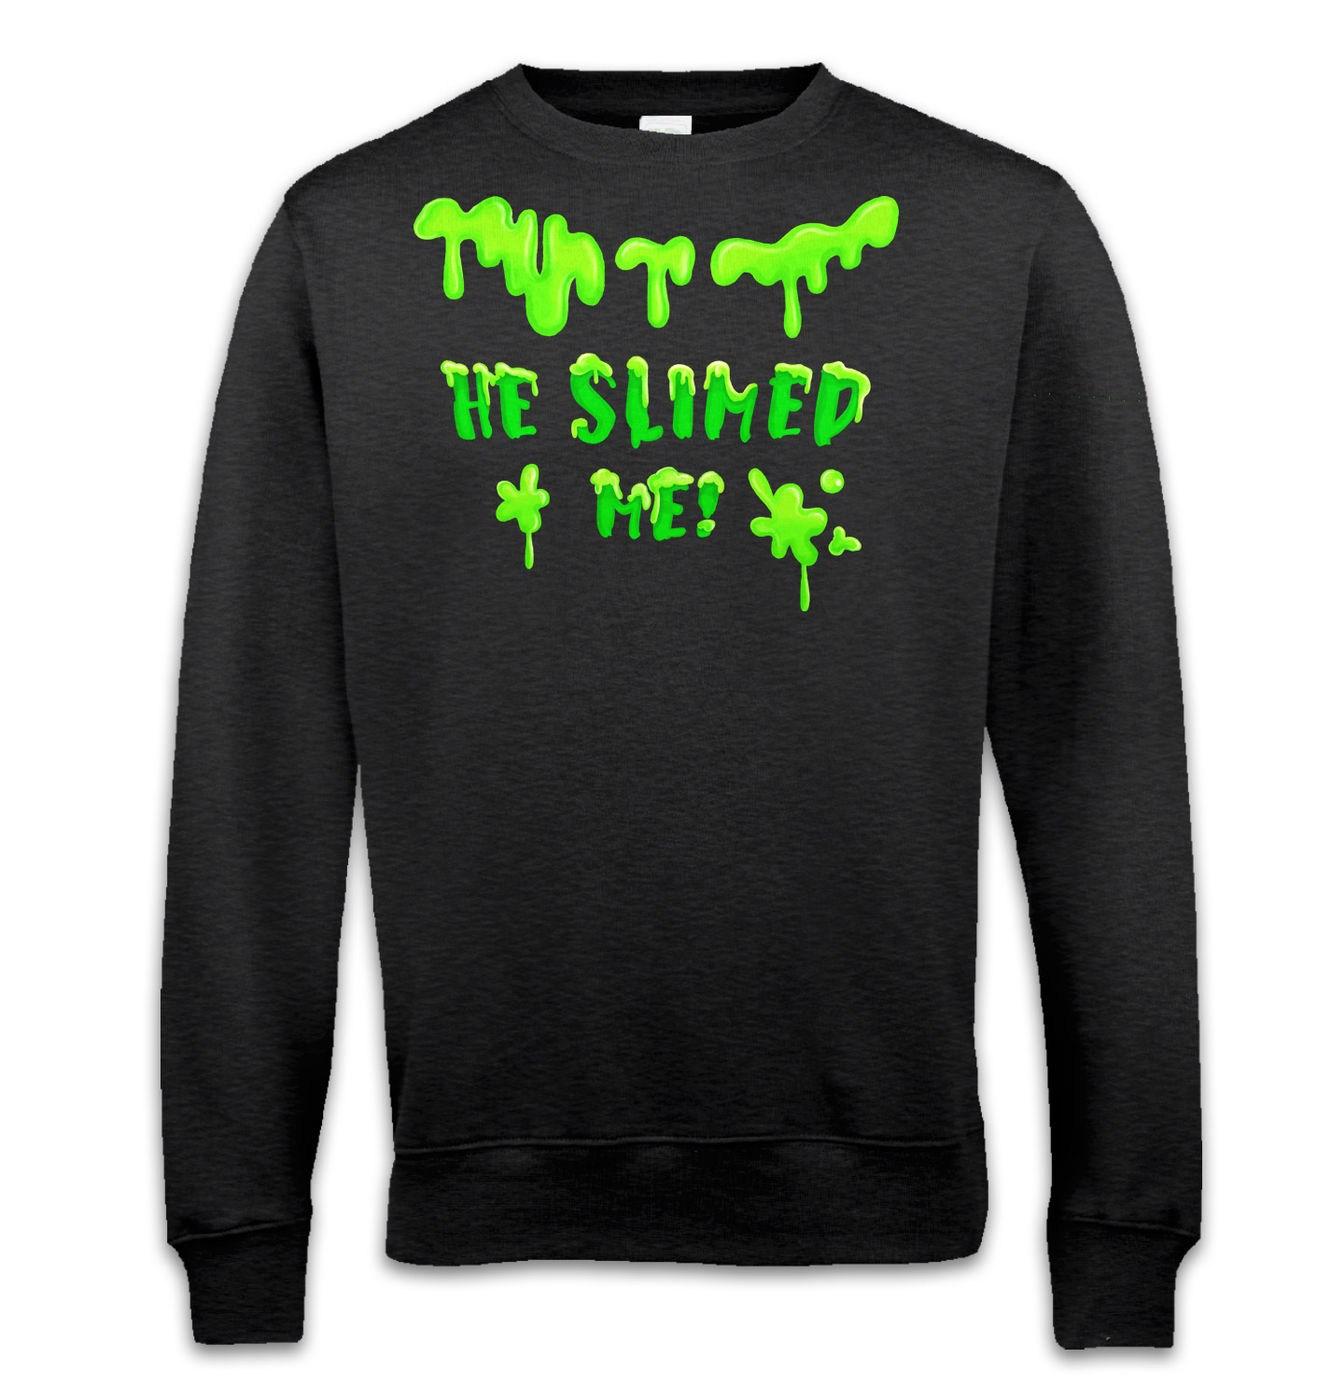 He Slimed Me movie quote sweatshirt